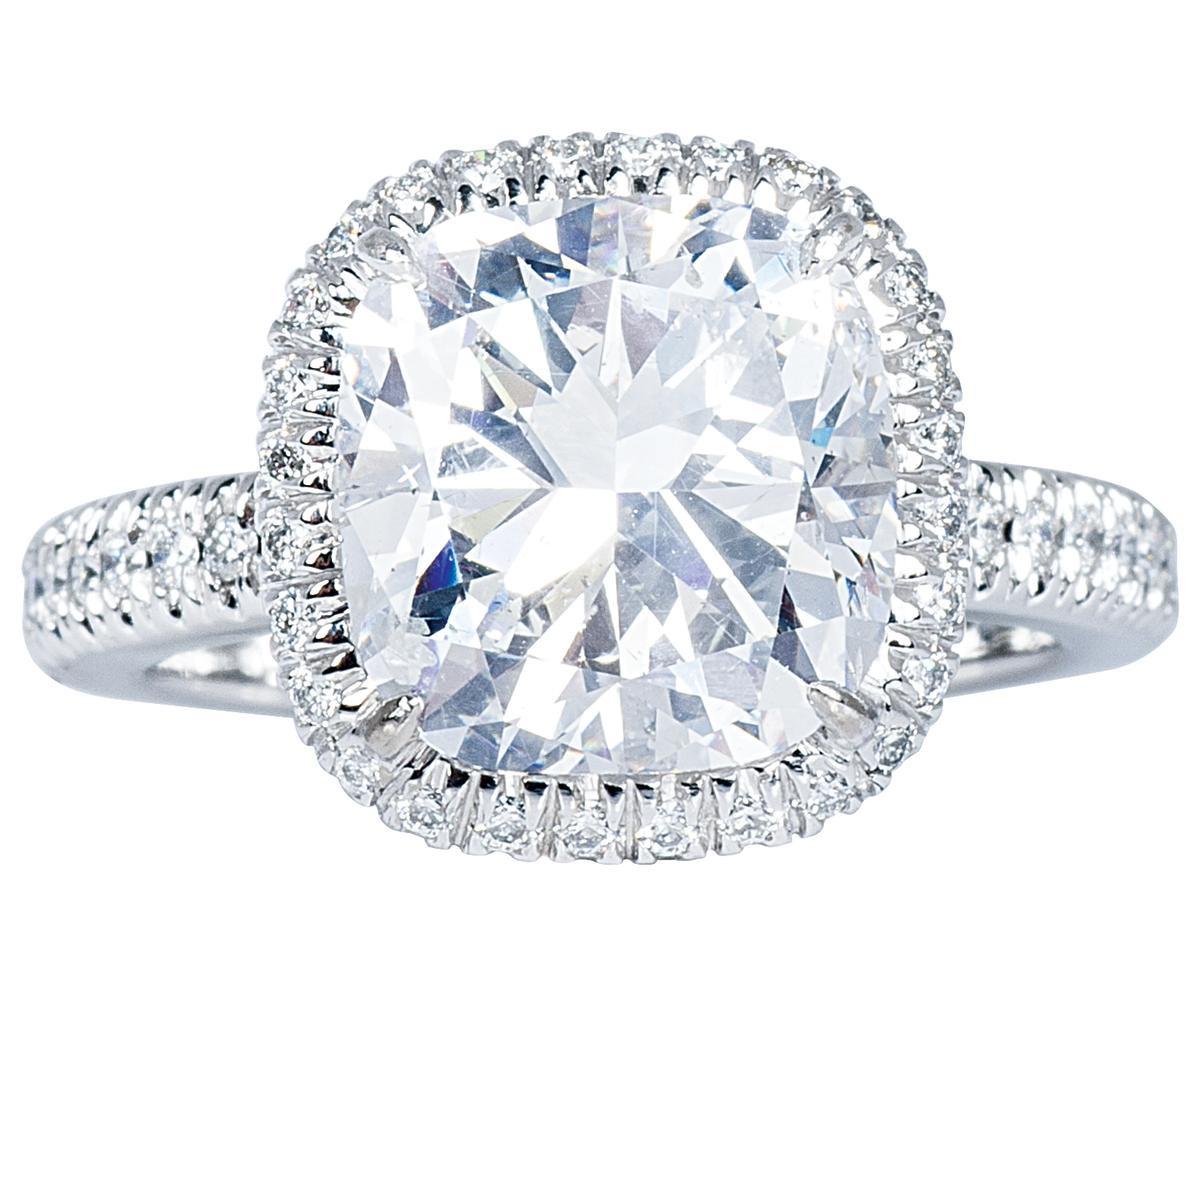 New 5.16 CTW Cushion-Cut Diamond Engagement Ring